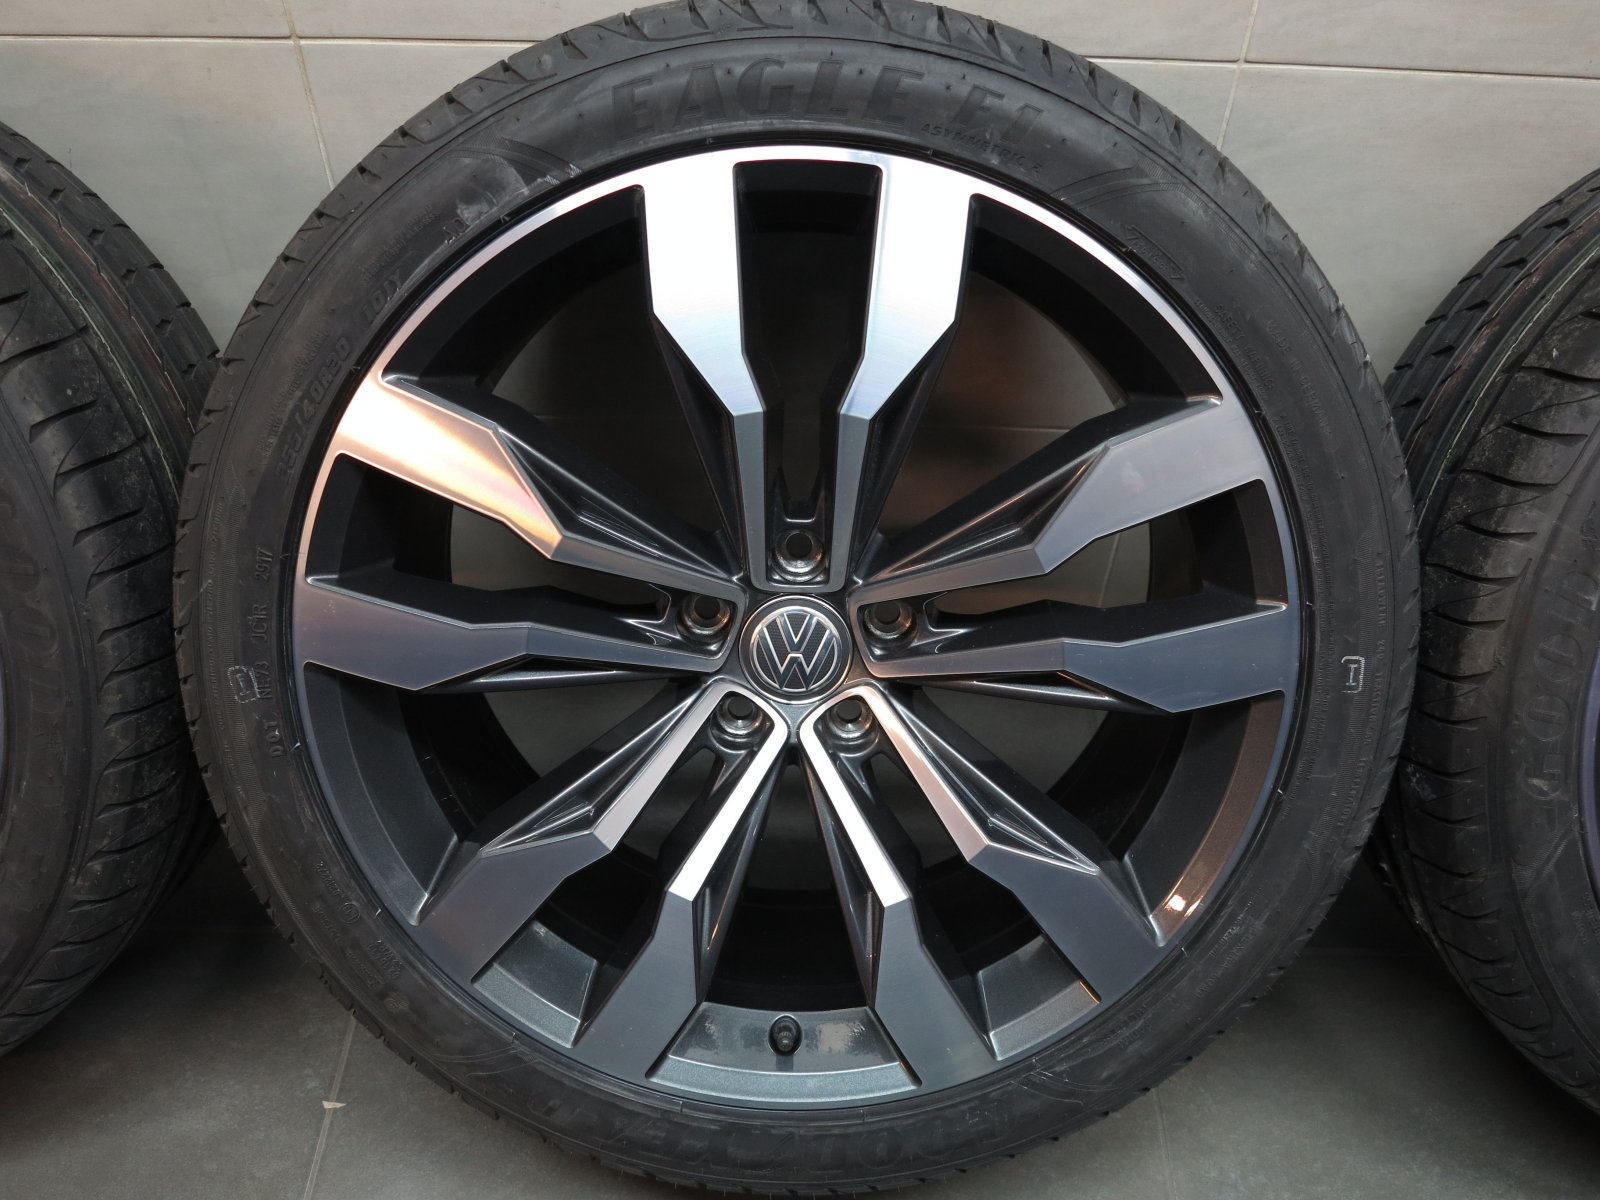 20 inch original summer wheels vw tiguan ii allspace r line suzuka 5na601025g ebay. Black Bedroom Furniture Sets. Home Design Ideas